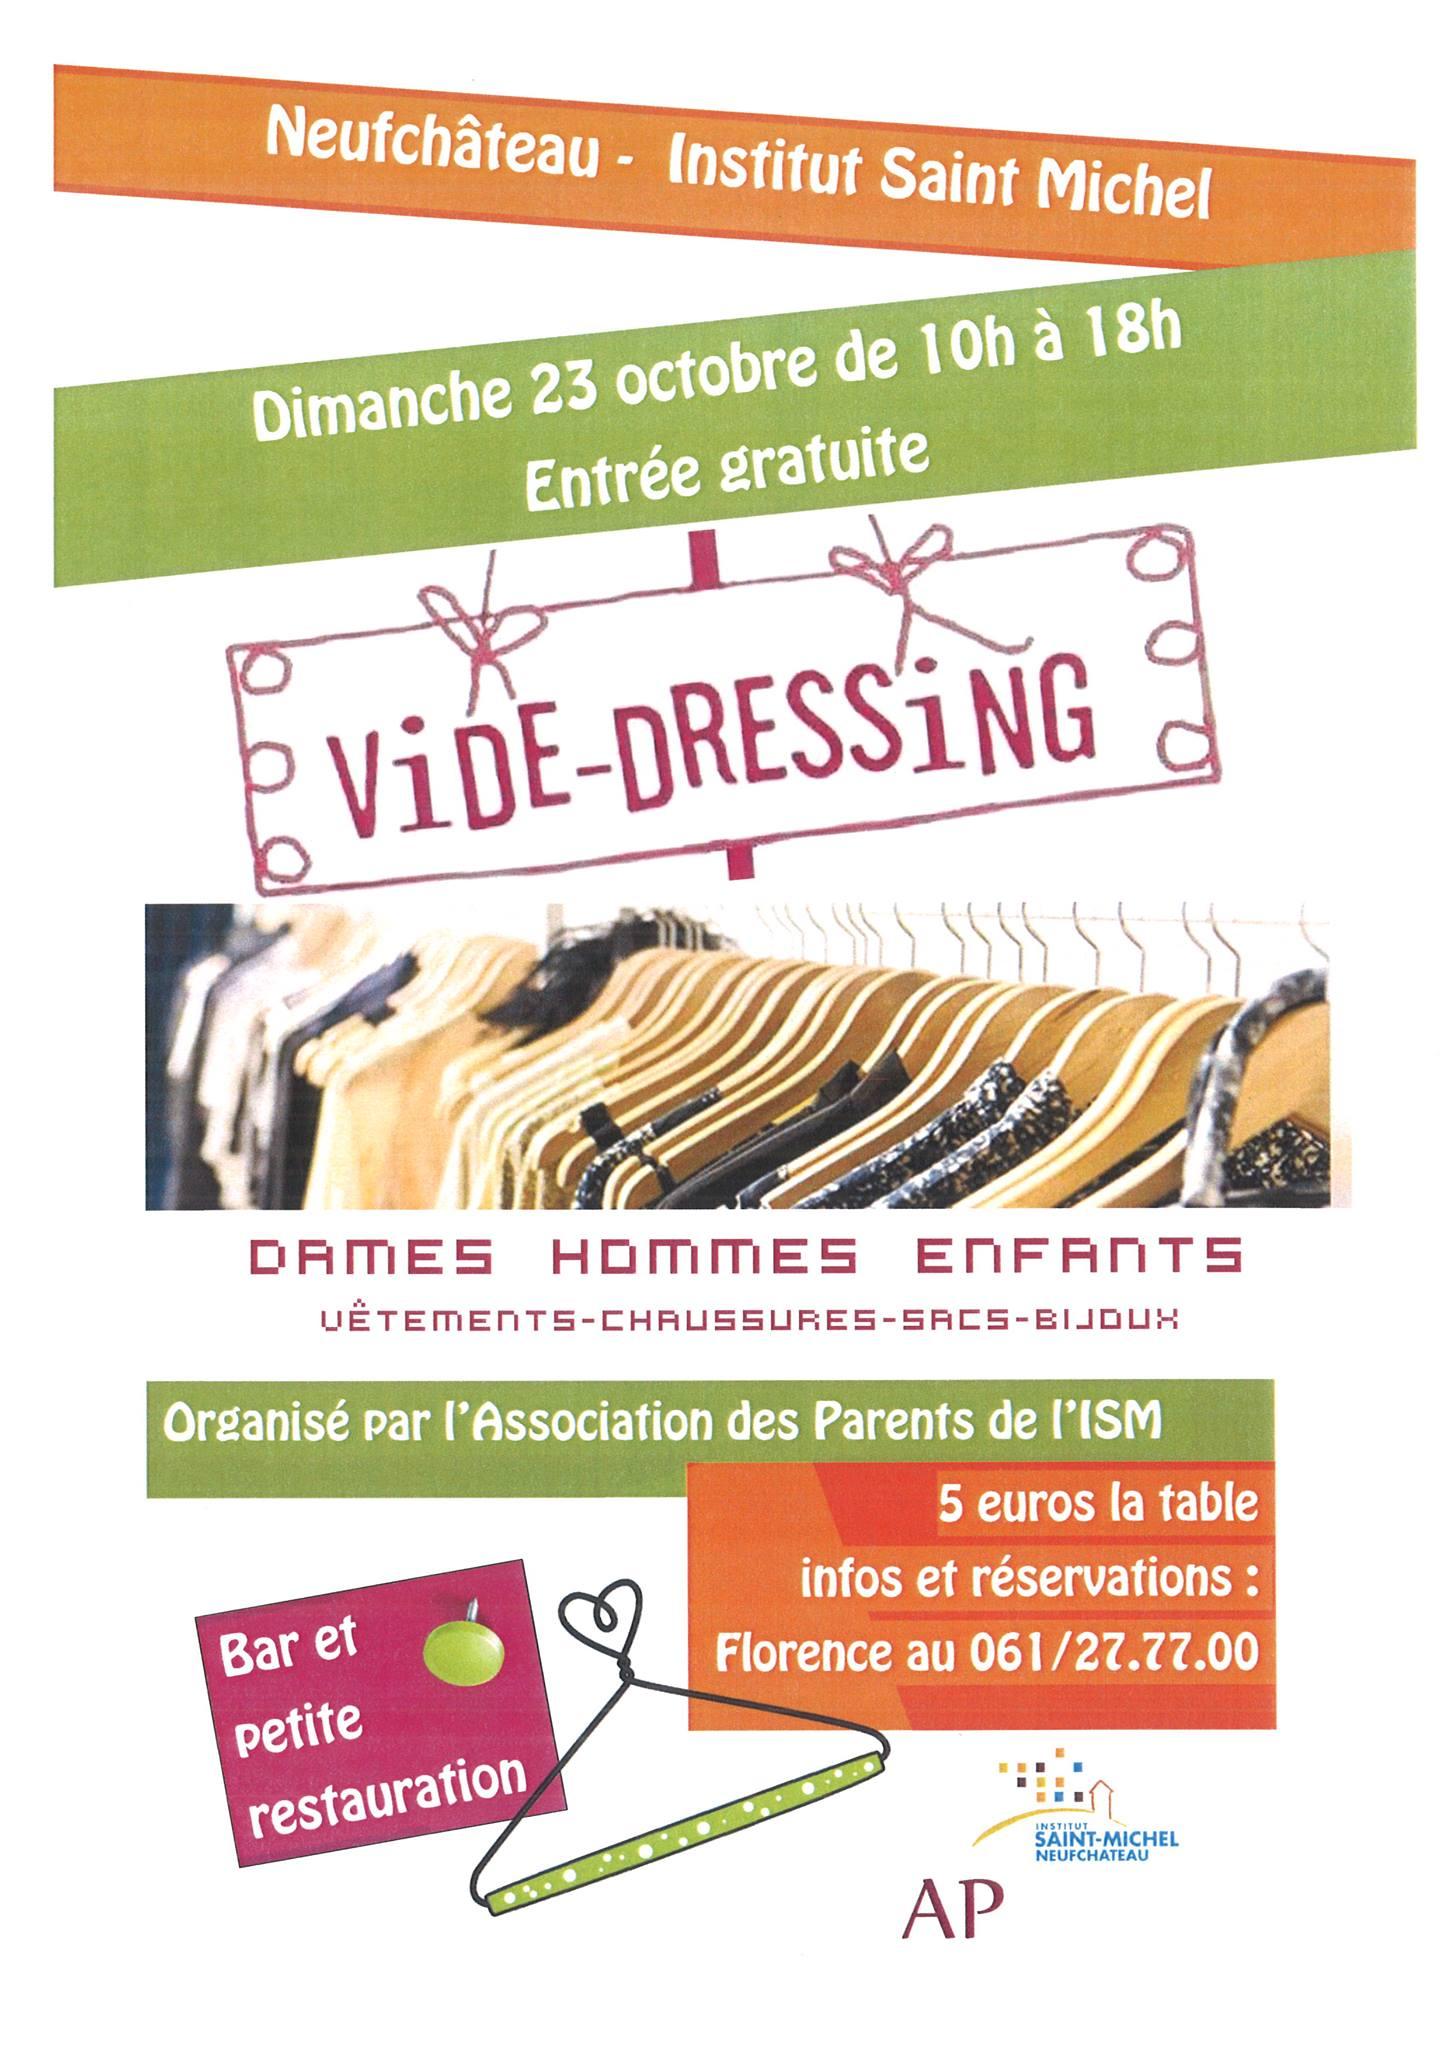 Neufchateau : vide-dressing à l'Institut Saint Michel